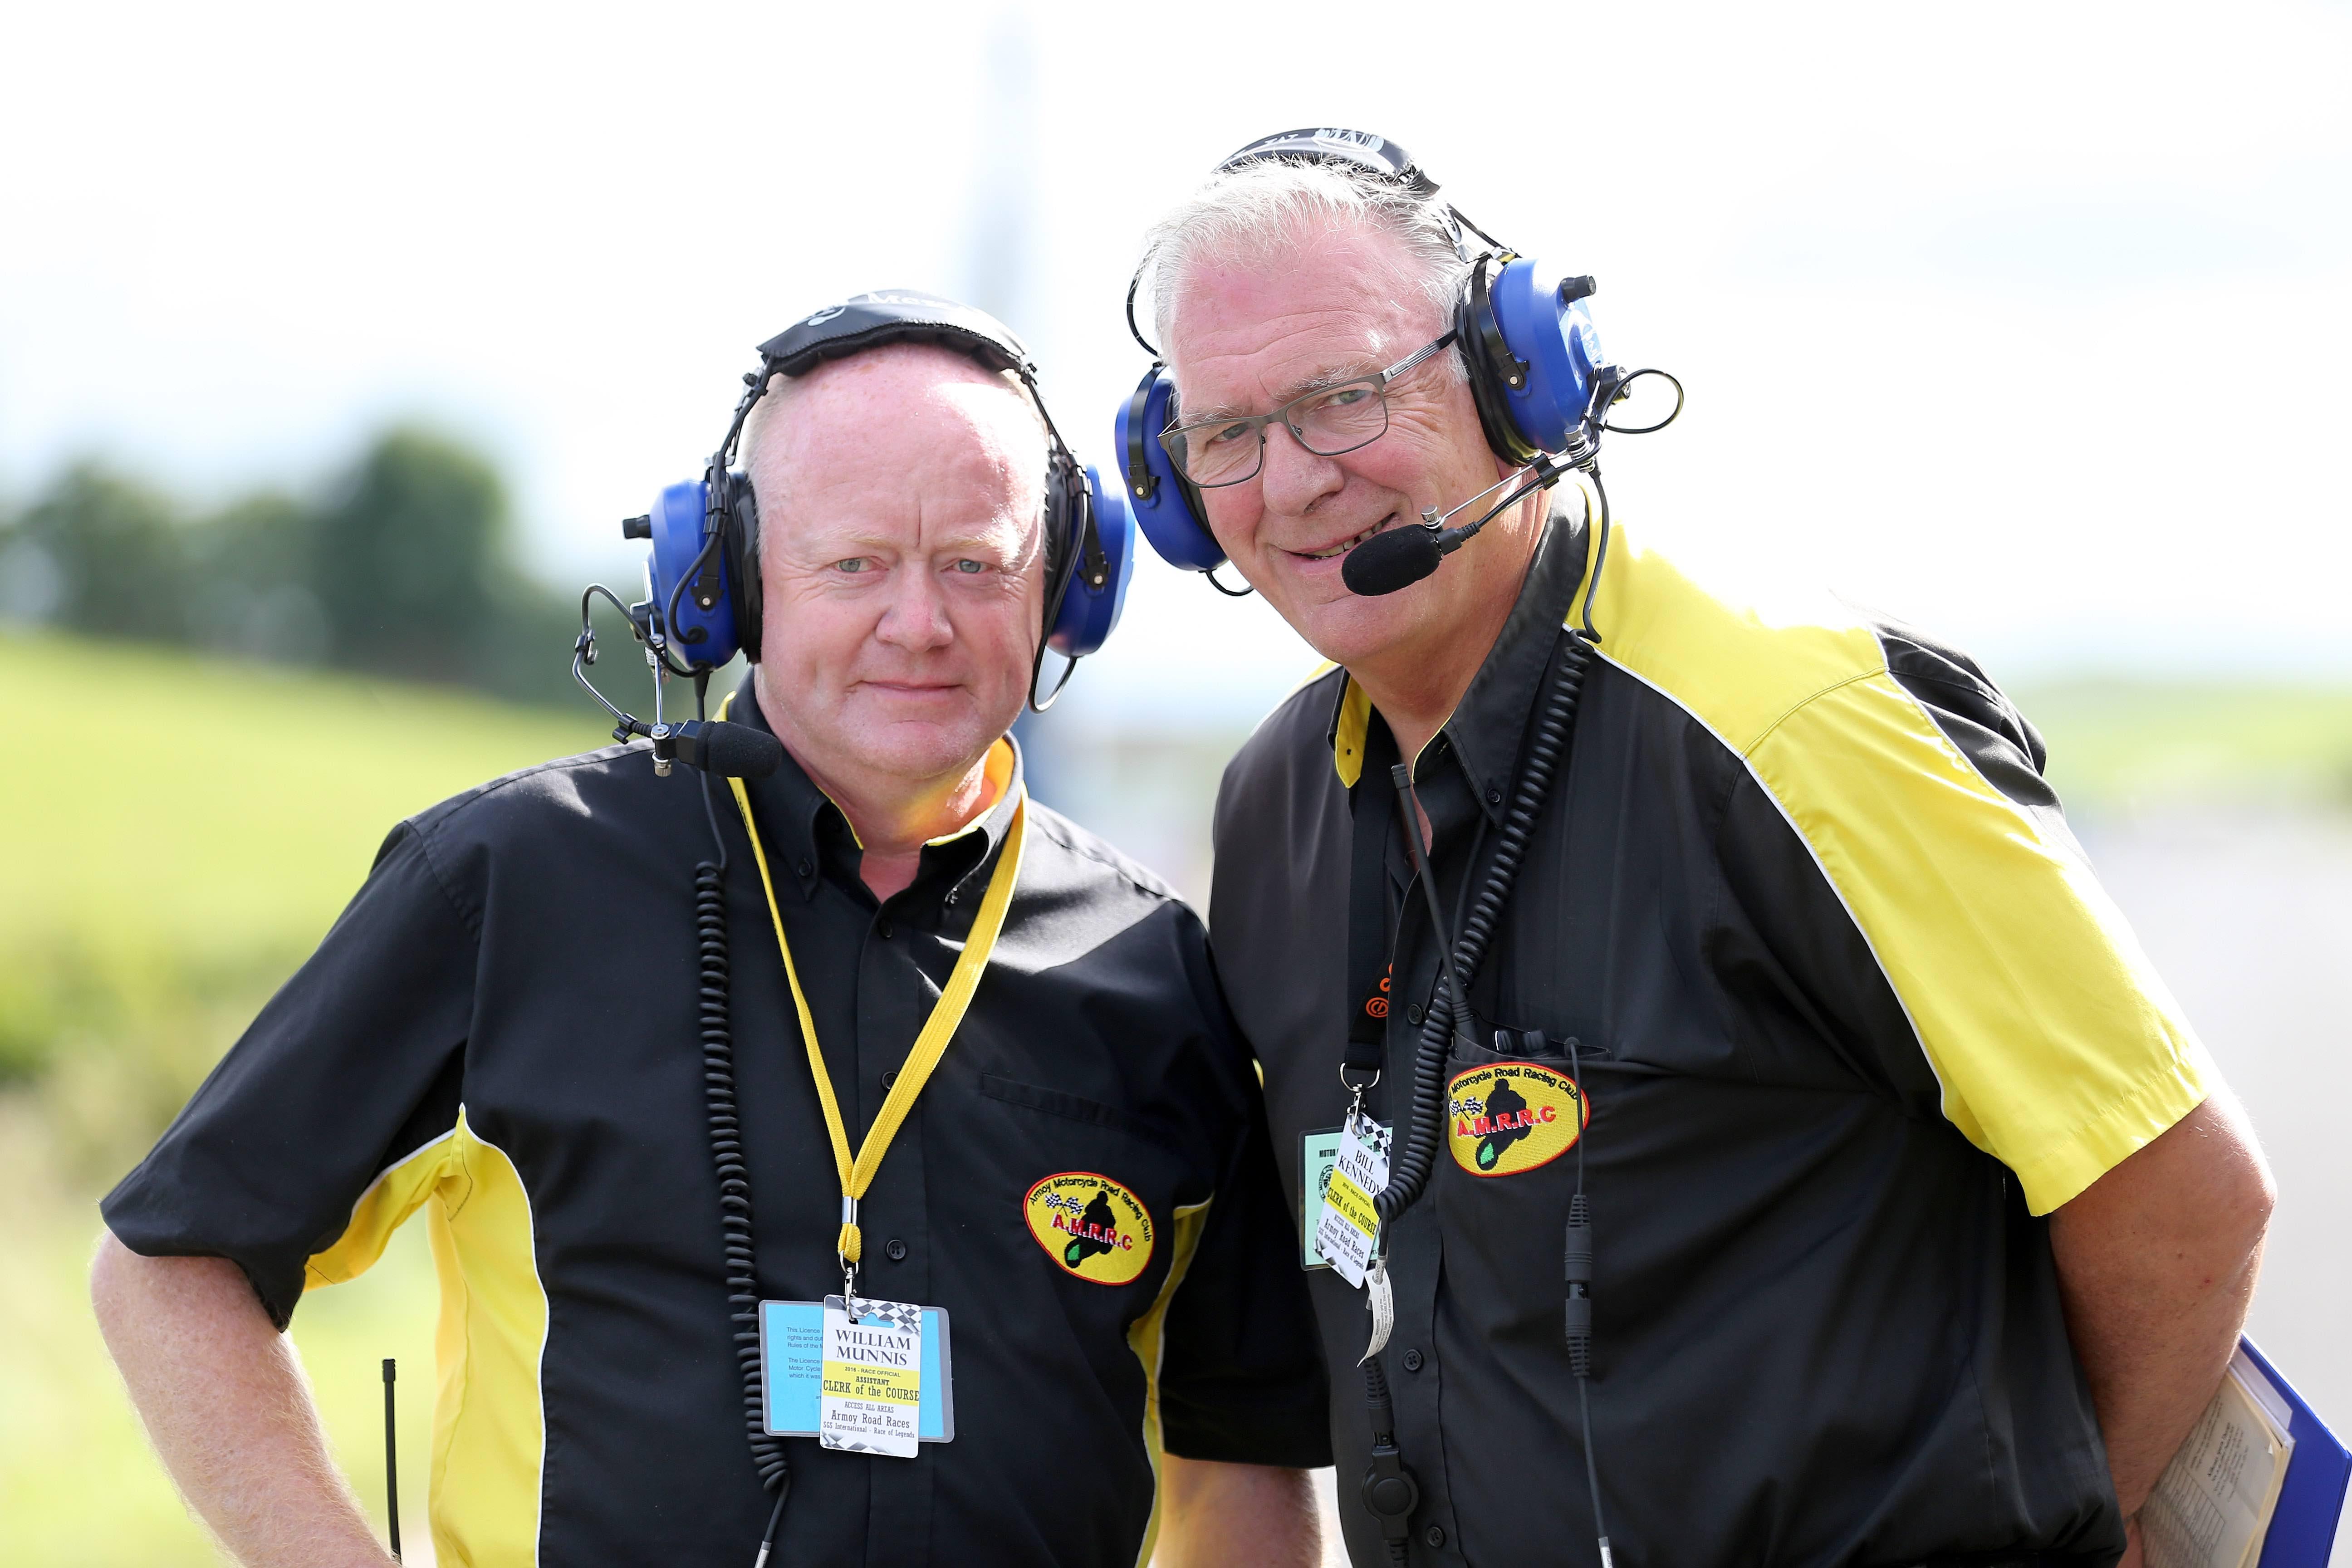 William Munnis and Bill Kennedy